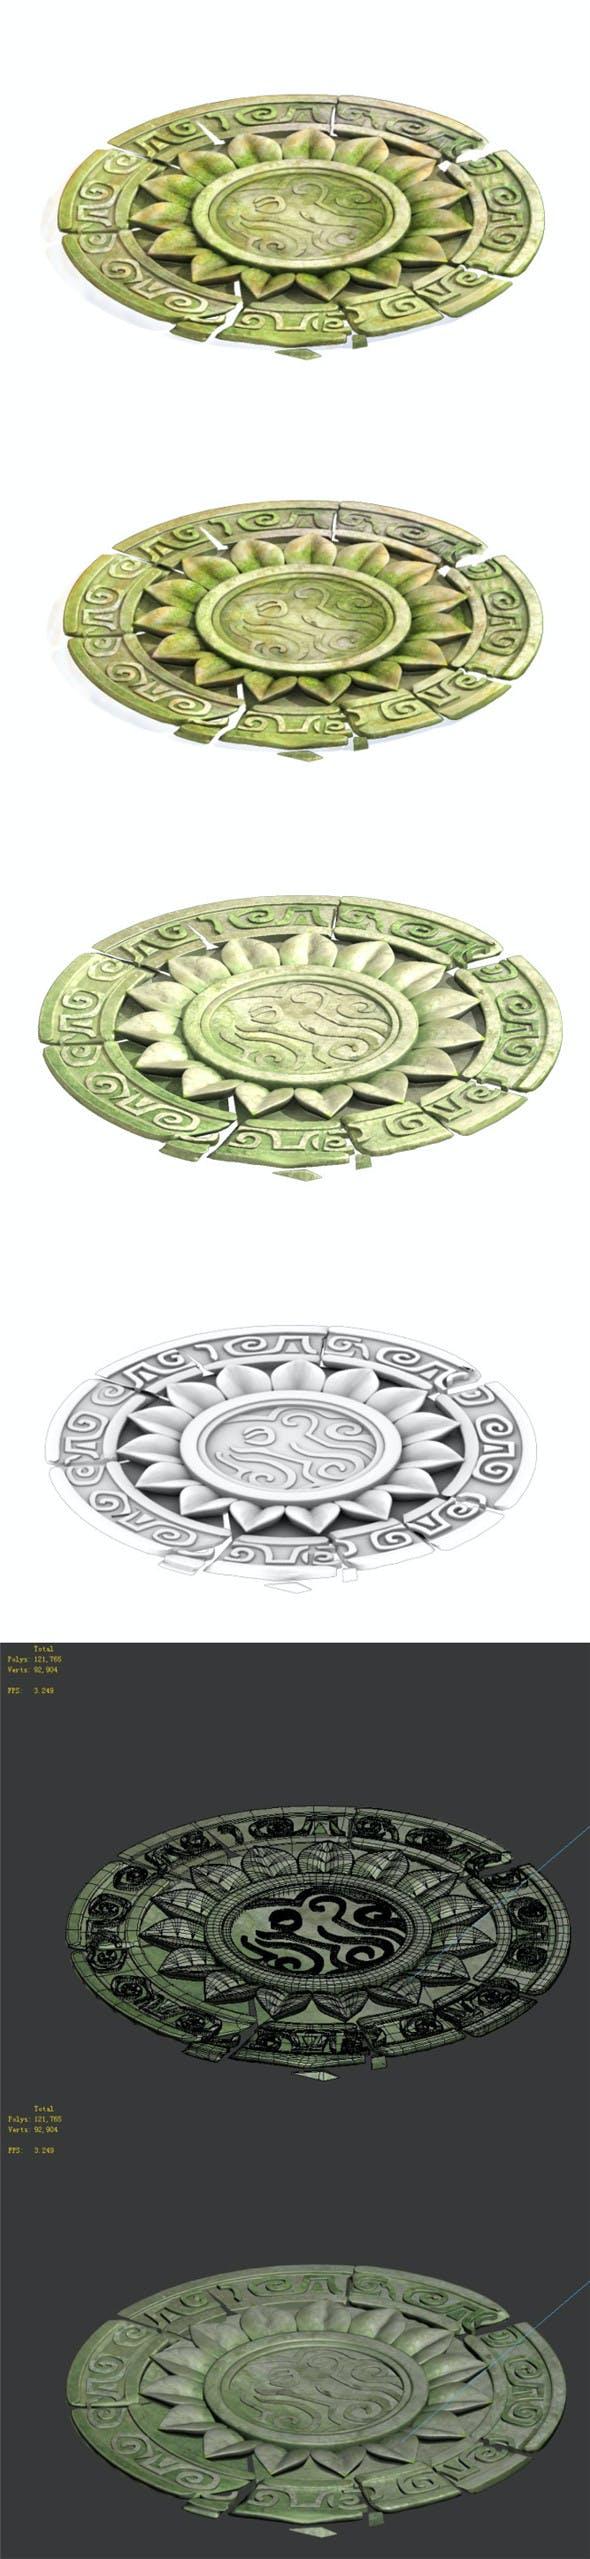 Central disc - 3DOcean Item for Sale